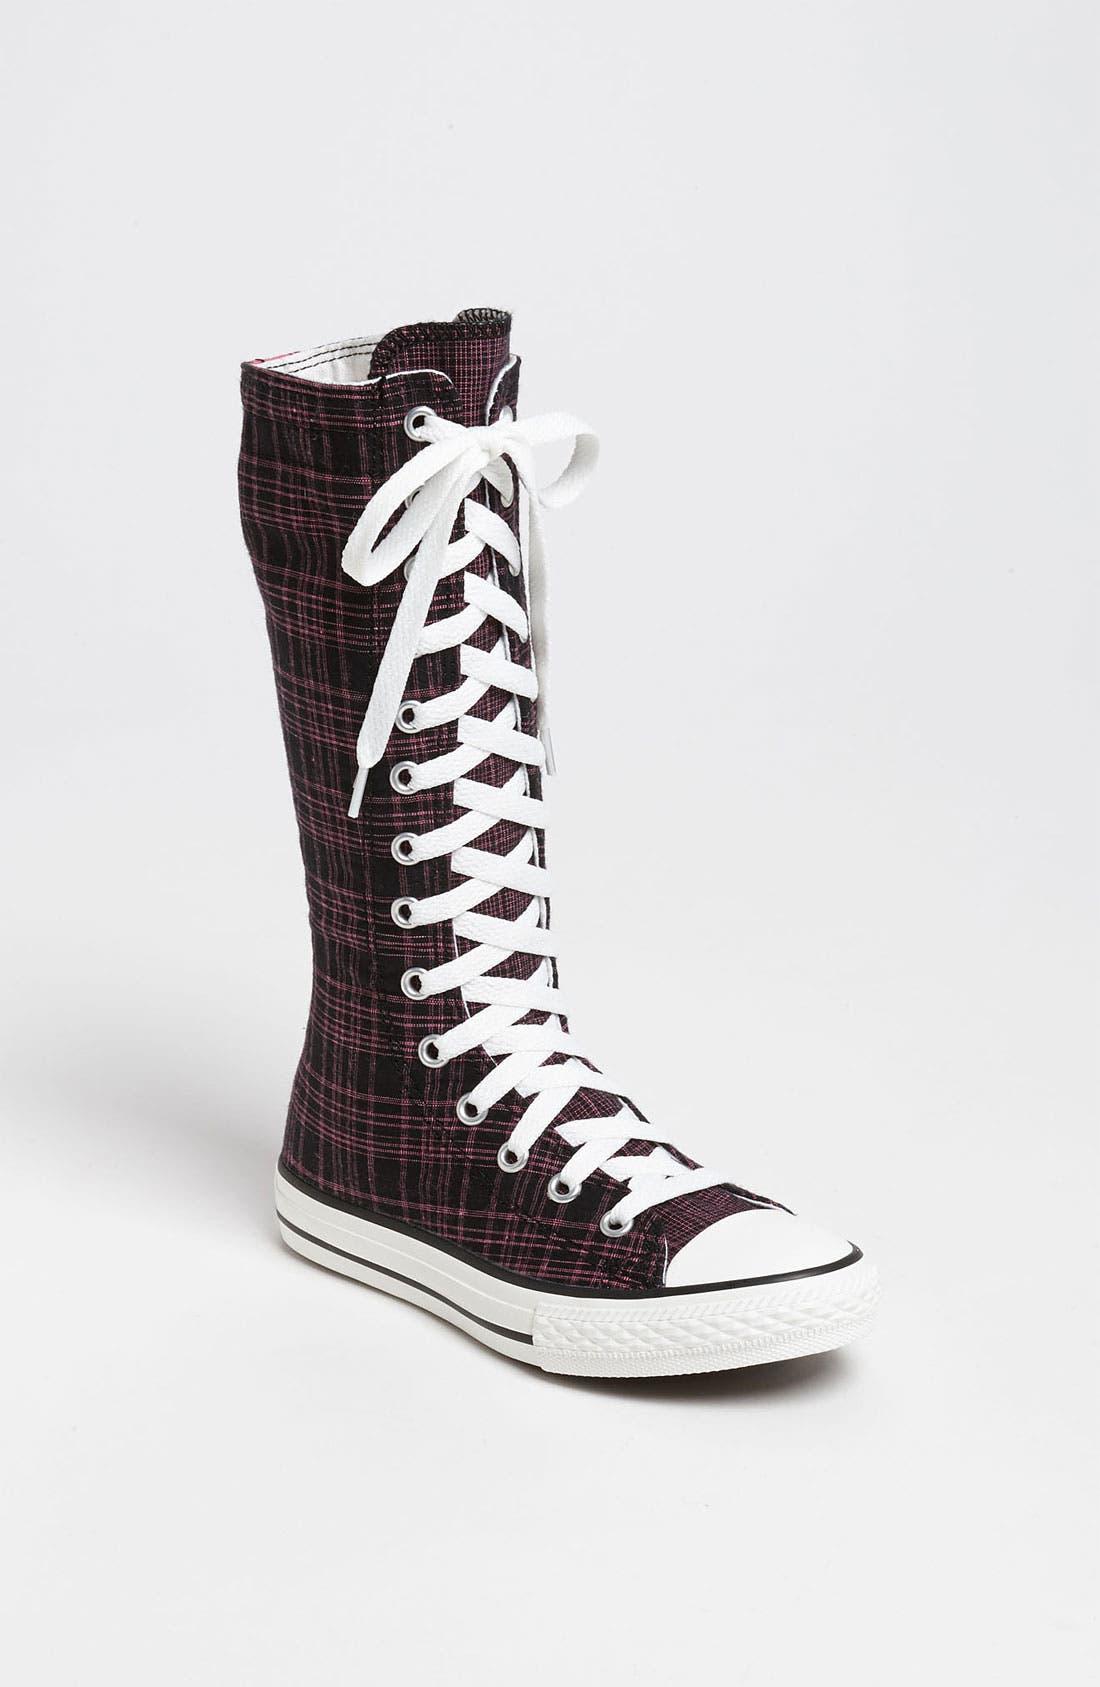 Alternate Image 1 Selected - Converse Chuck Taylor® All Star® 'X-Hi' Sneaker (Toddler, Little Kid & Big Kid)